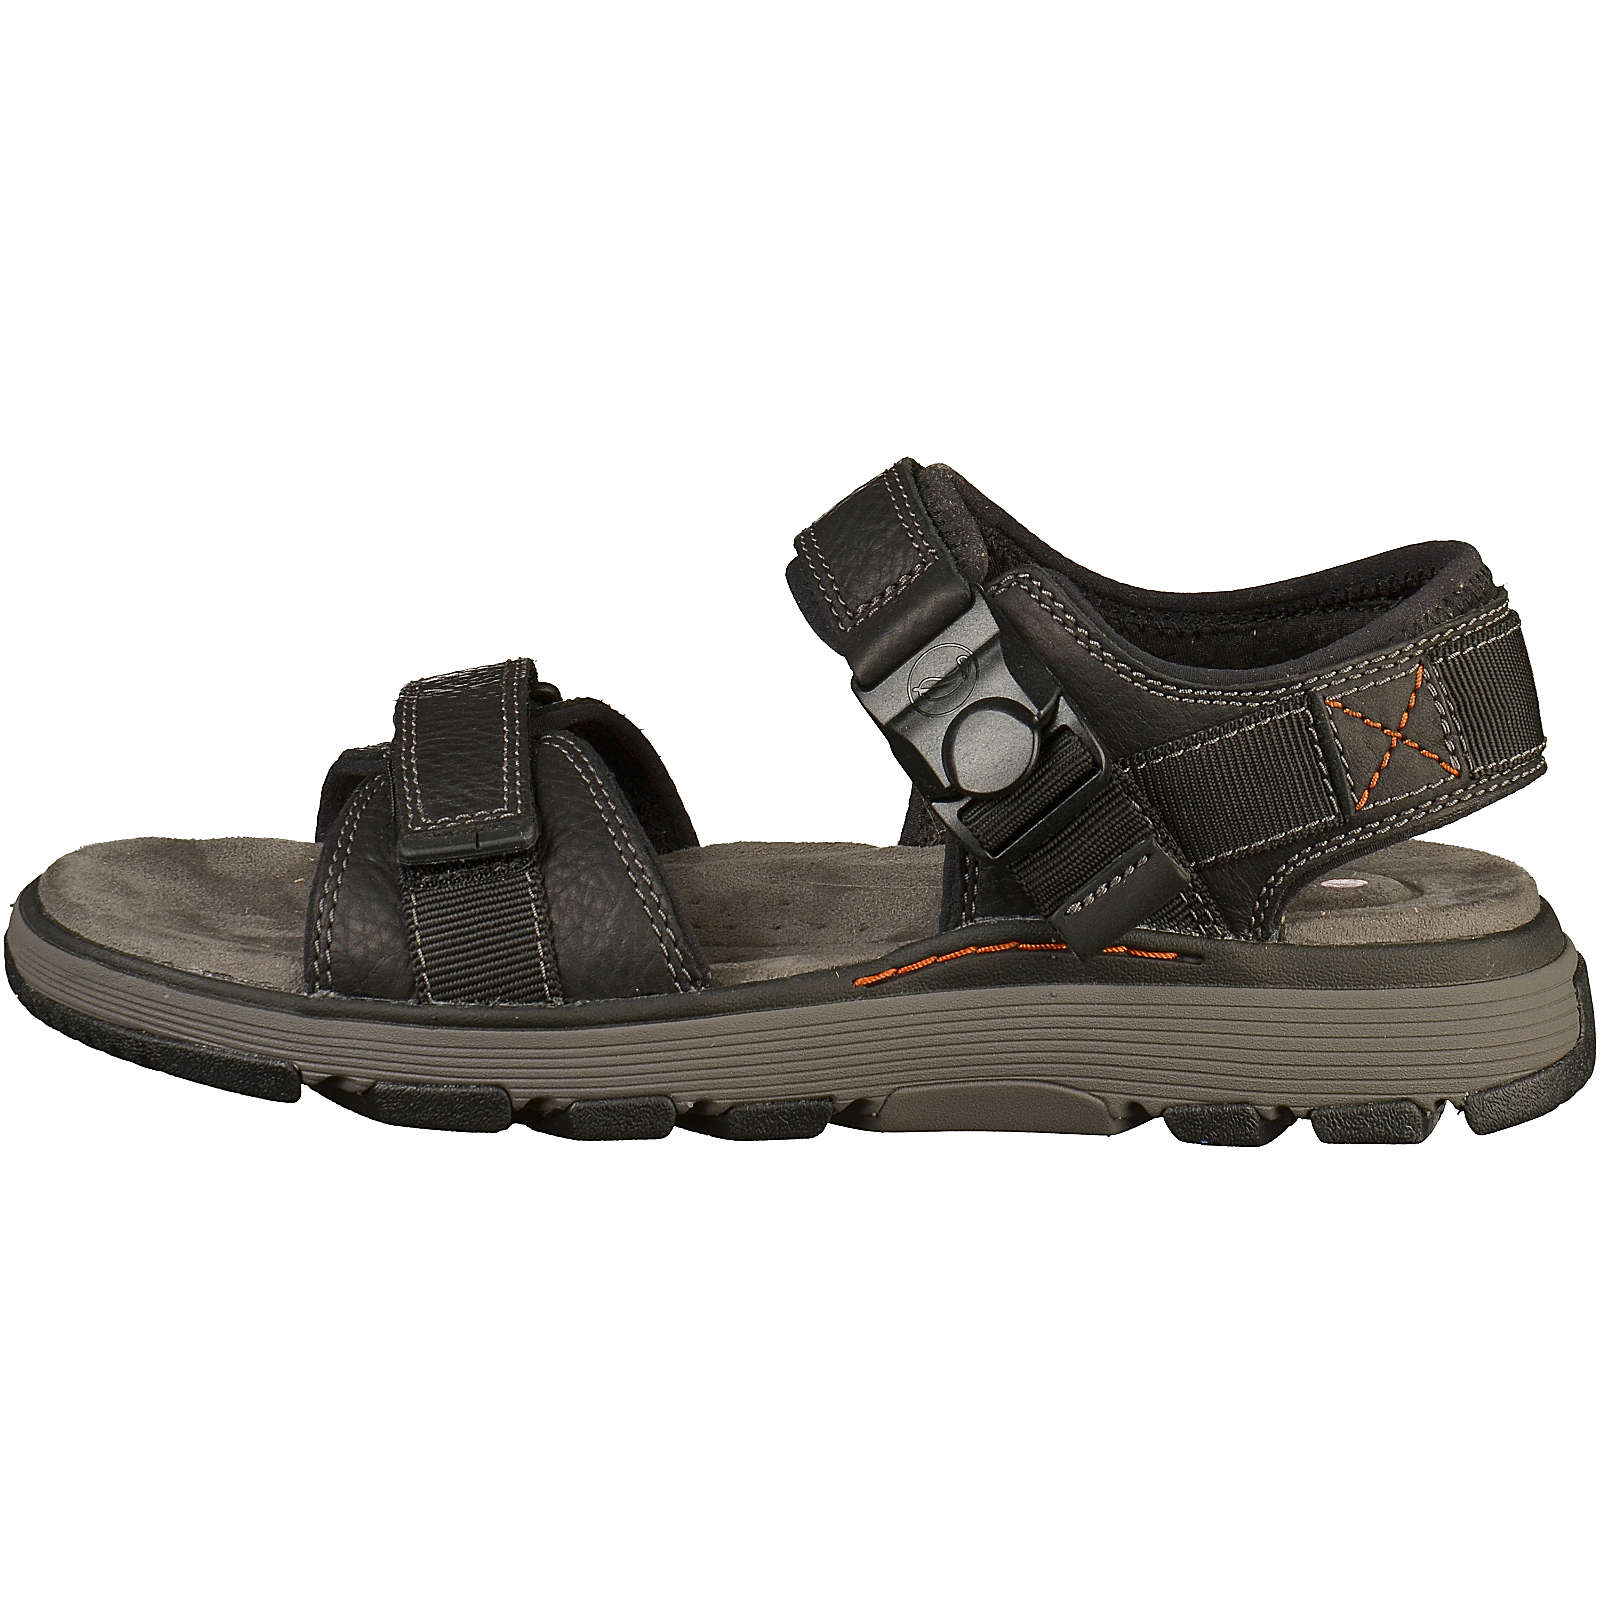 Clarks Komfort-Sandalen schwarz Herren Gr. 41,5